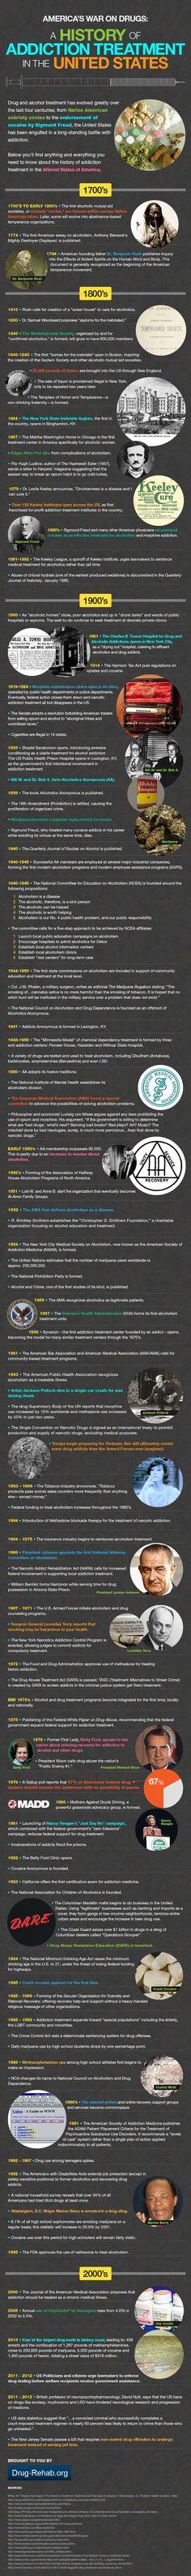 infographiclist.files.wordpress.com 2014 02 ahistoryofaddictiontreatmentintheus_4ffdac6d7c466.jpg